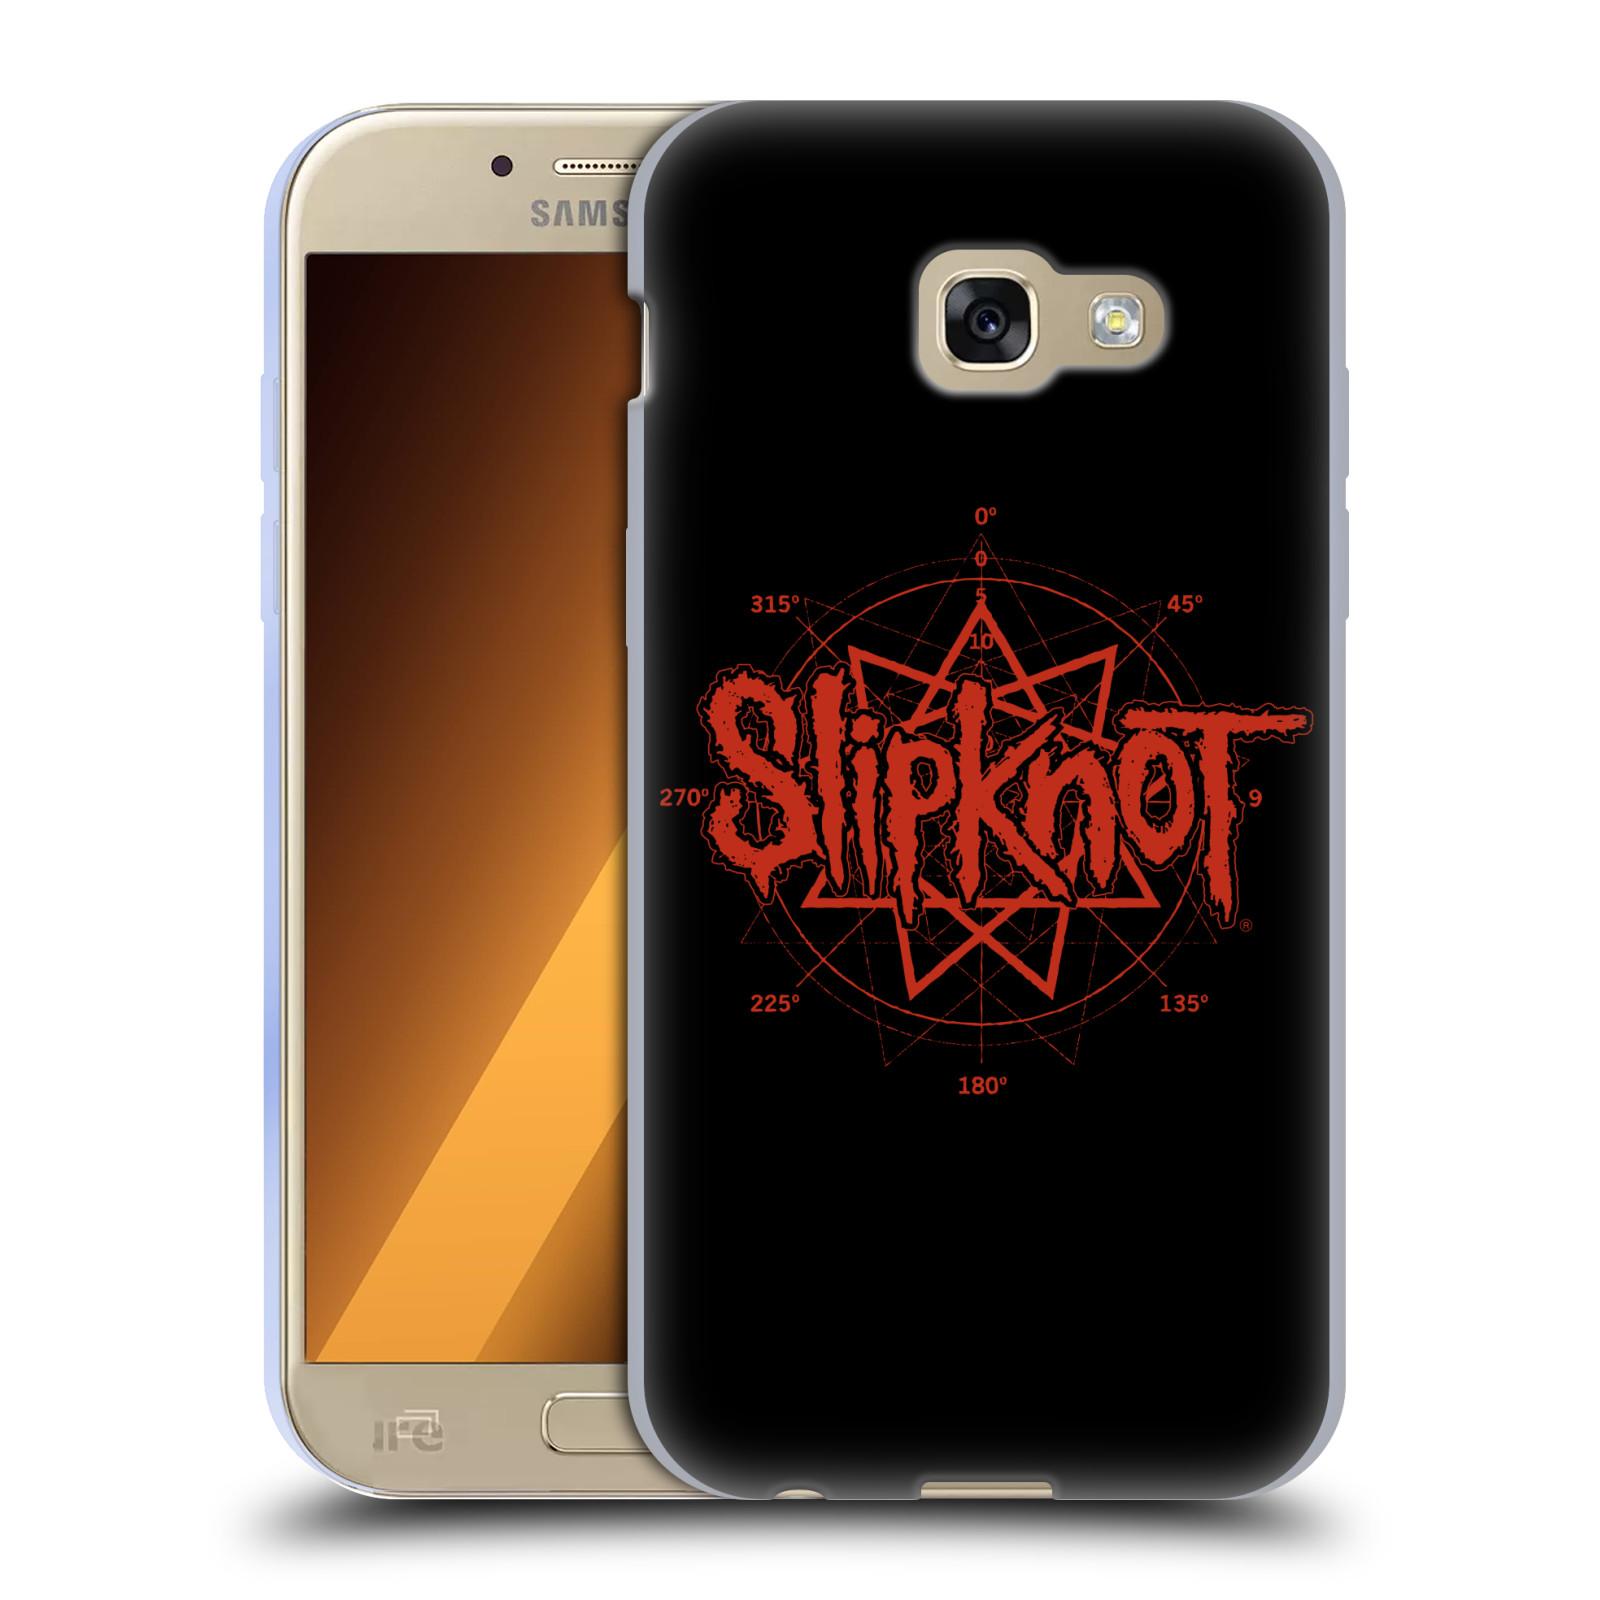 HEAD CASE silikonový obal na mobil Samsung Galaxy A5 2017 (A520) hudební skupina Slipknot logo